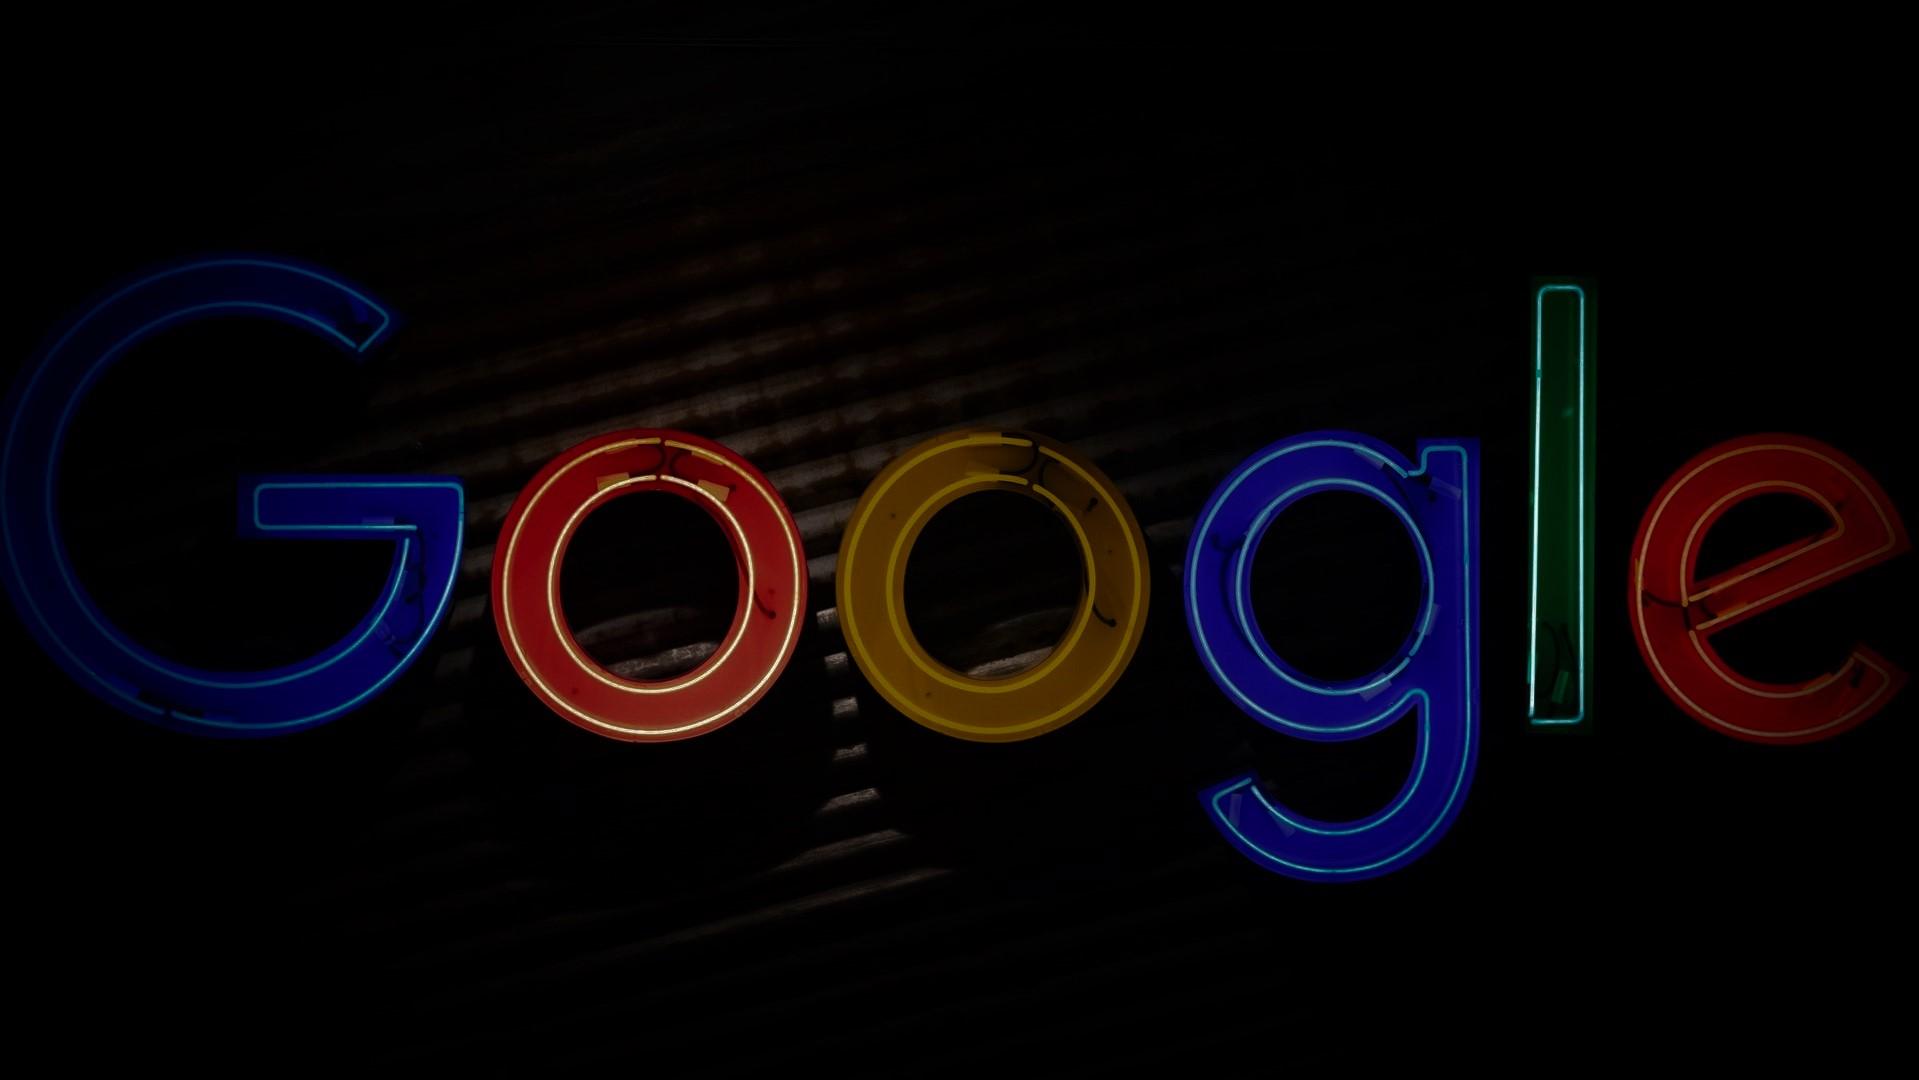 Search Engine & SEO News: Google's June 2021 Core Update